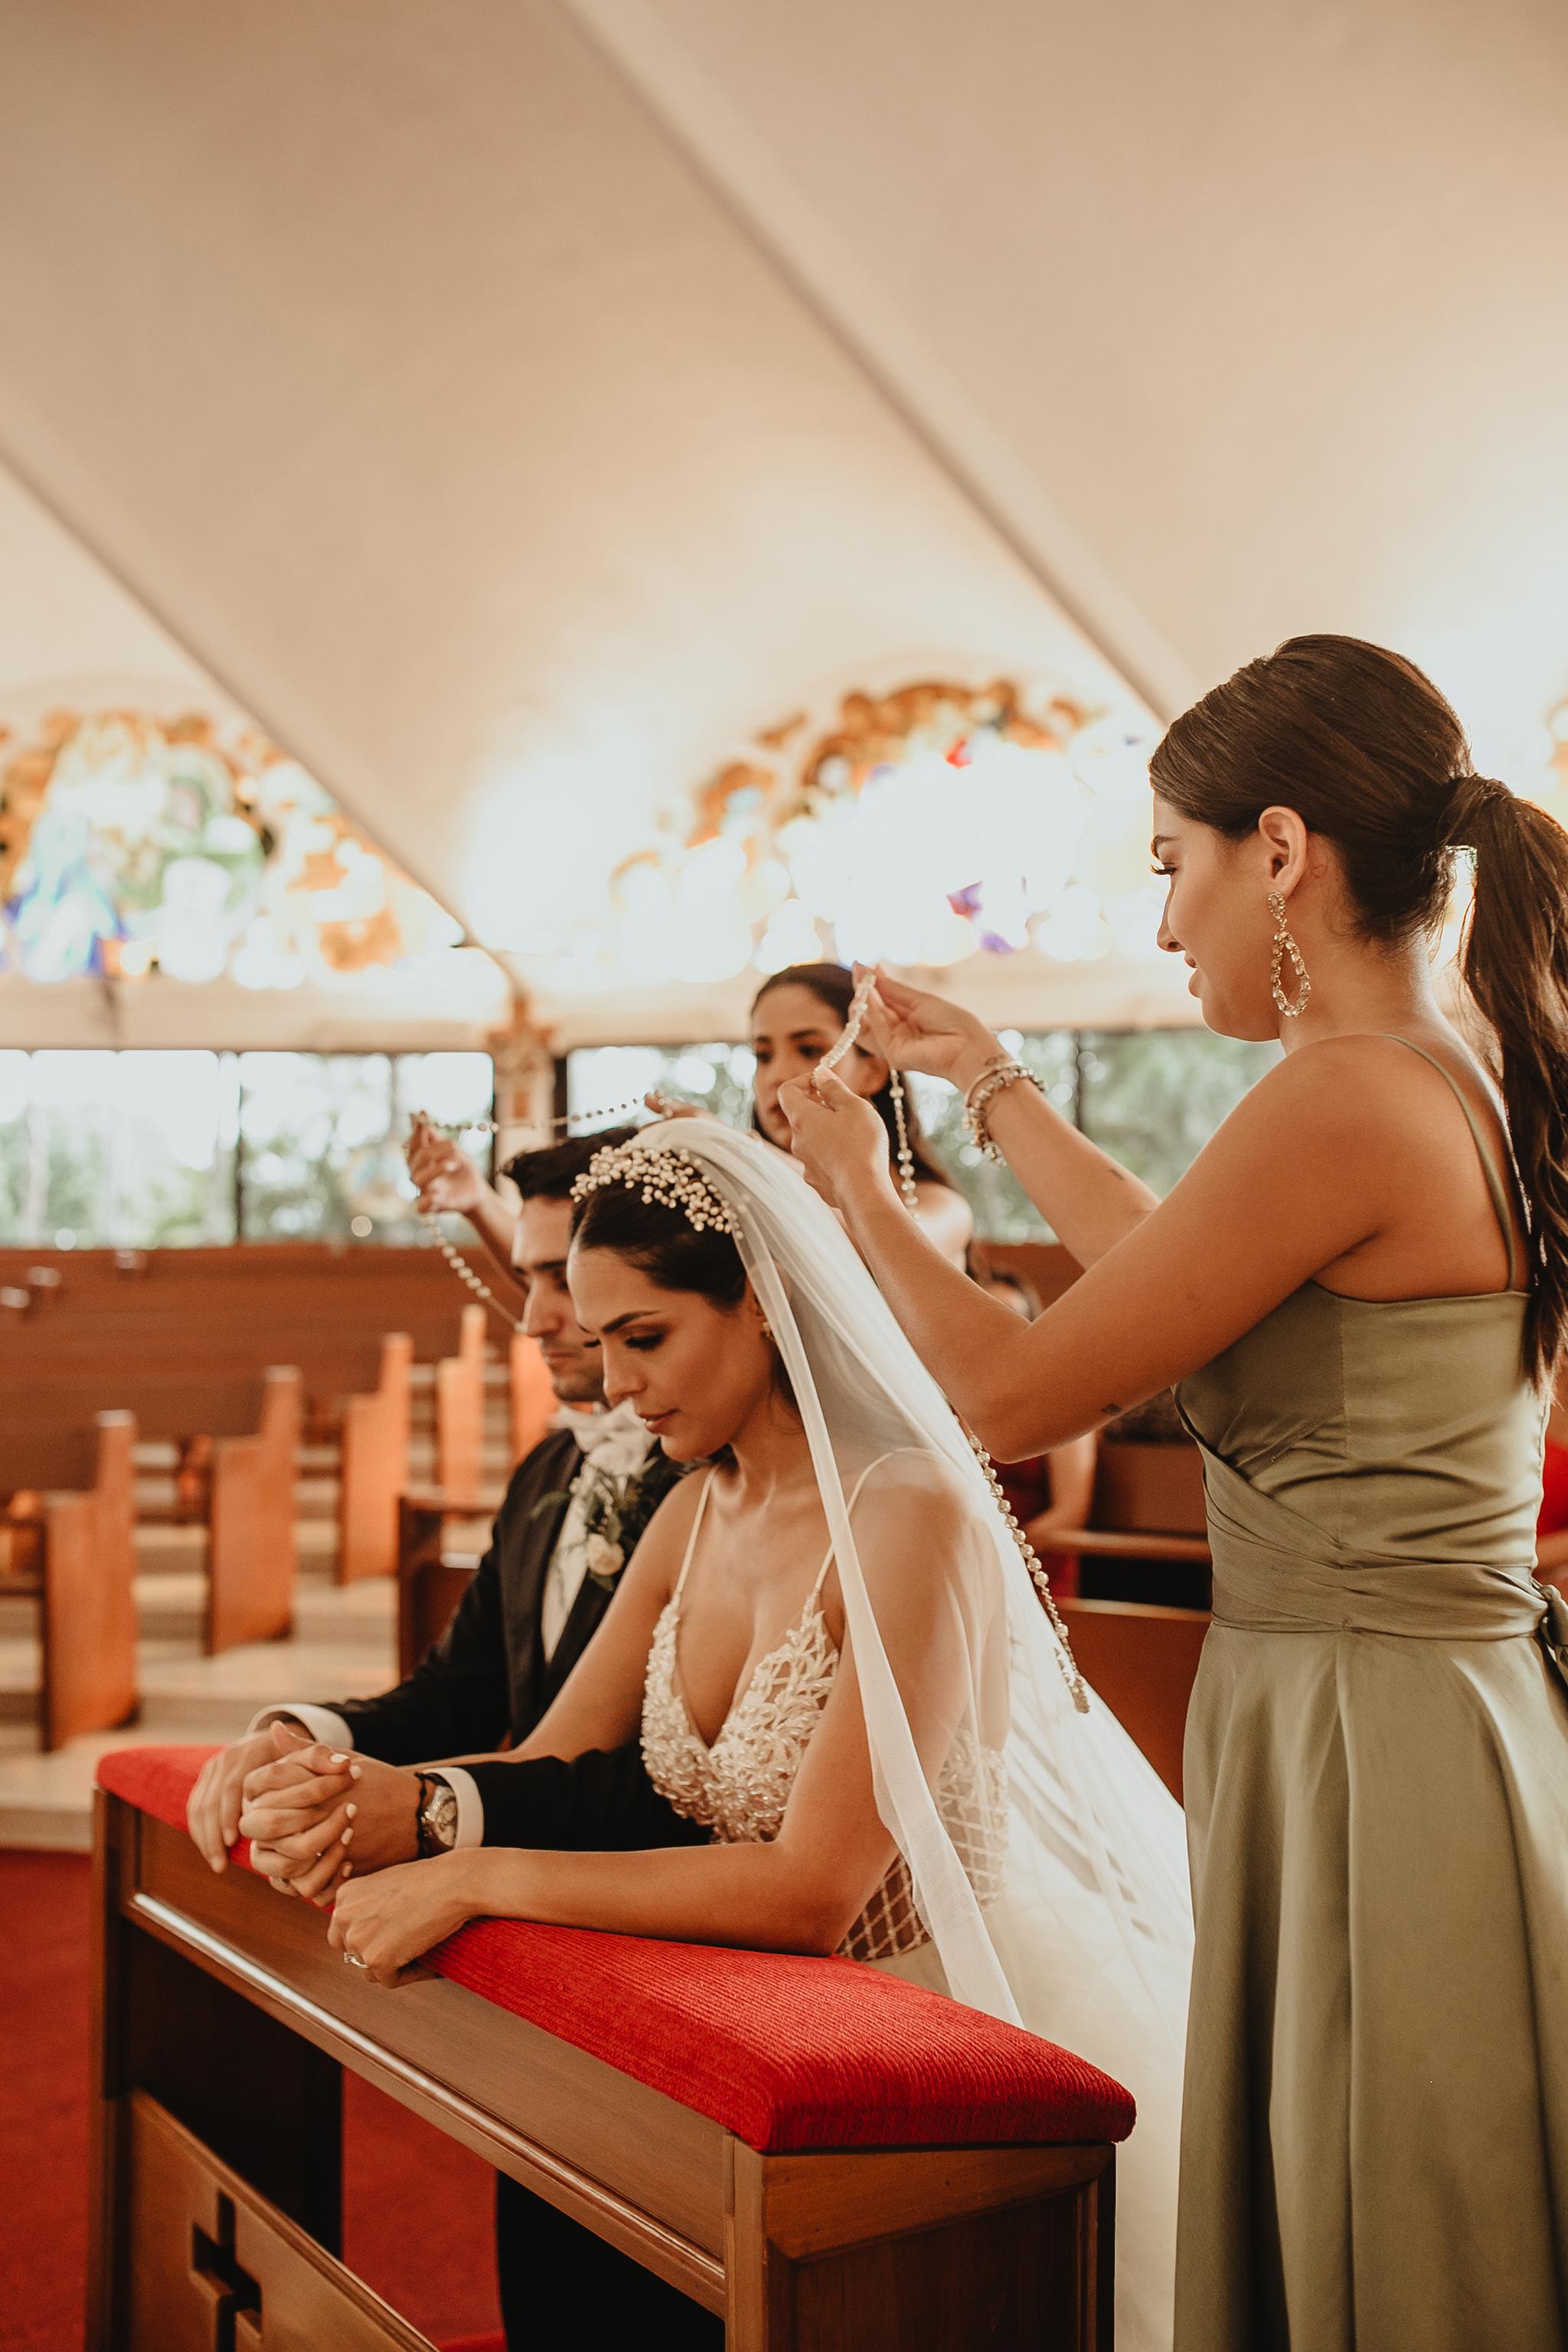 0679R&F__WeddingDestination_Weddingmerida_BodaMexico_FotografoDeBodas_FabrizioSimoneenFotografo.jpg